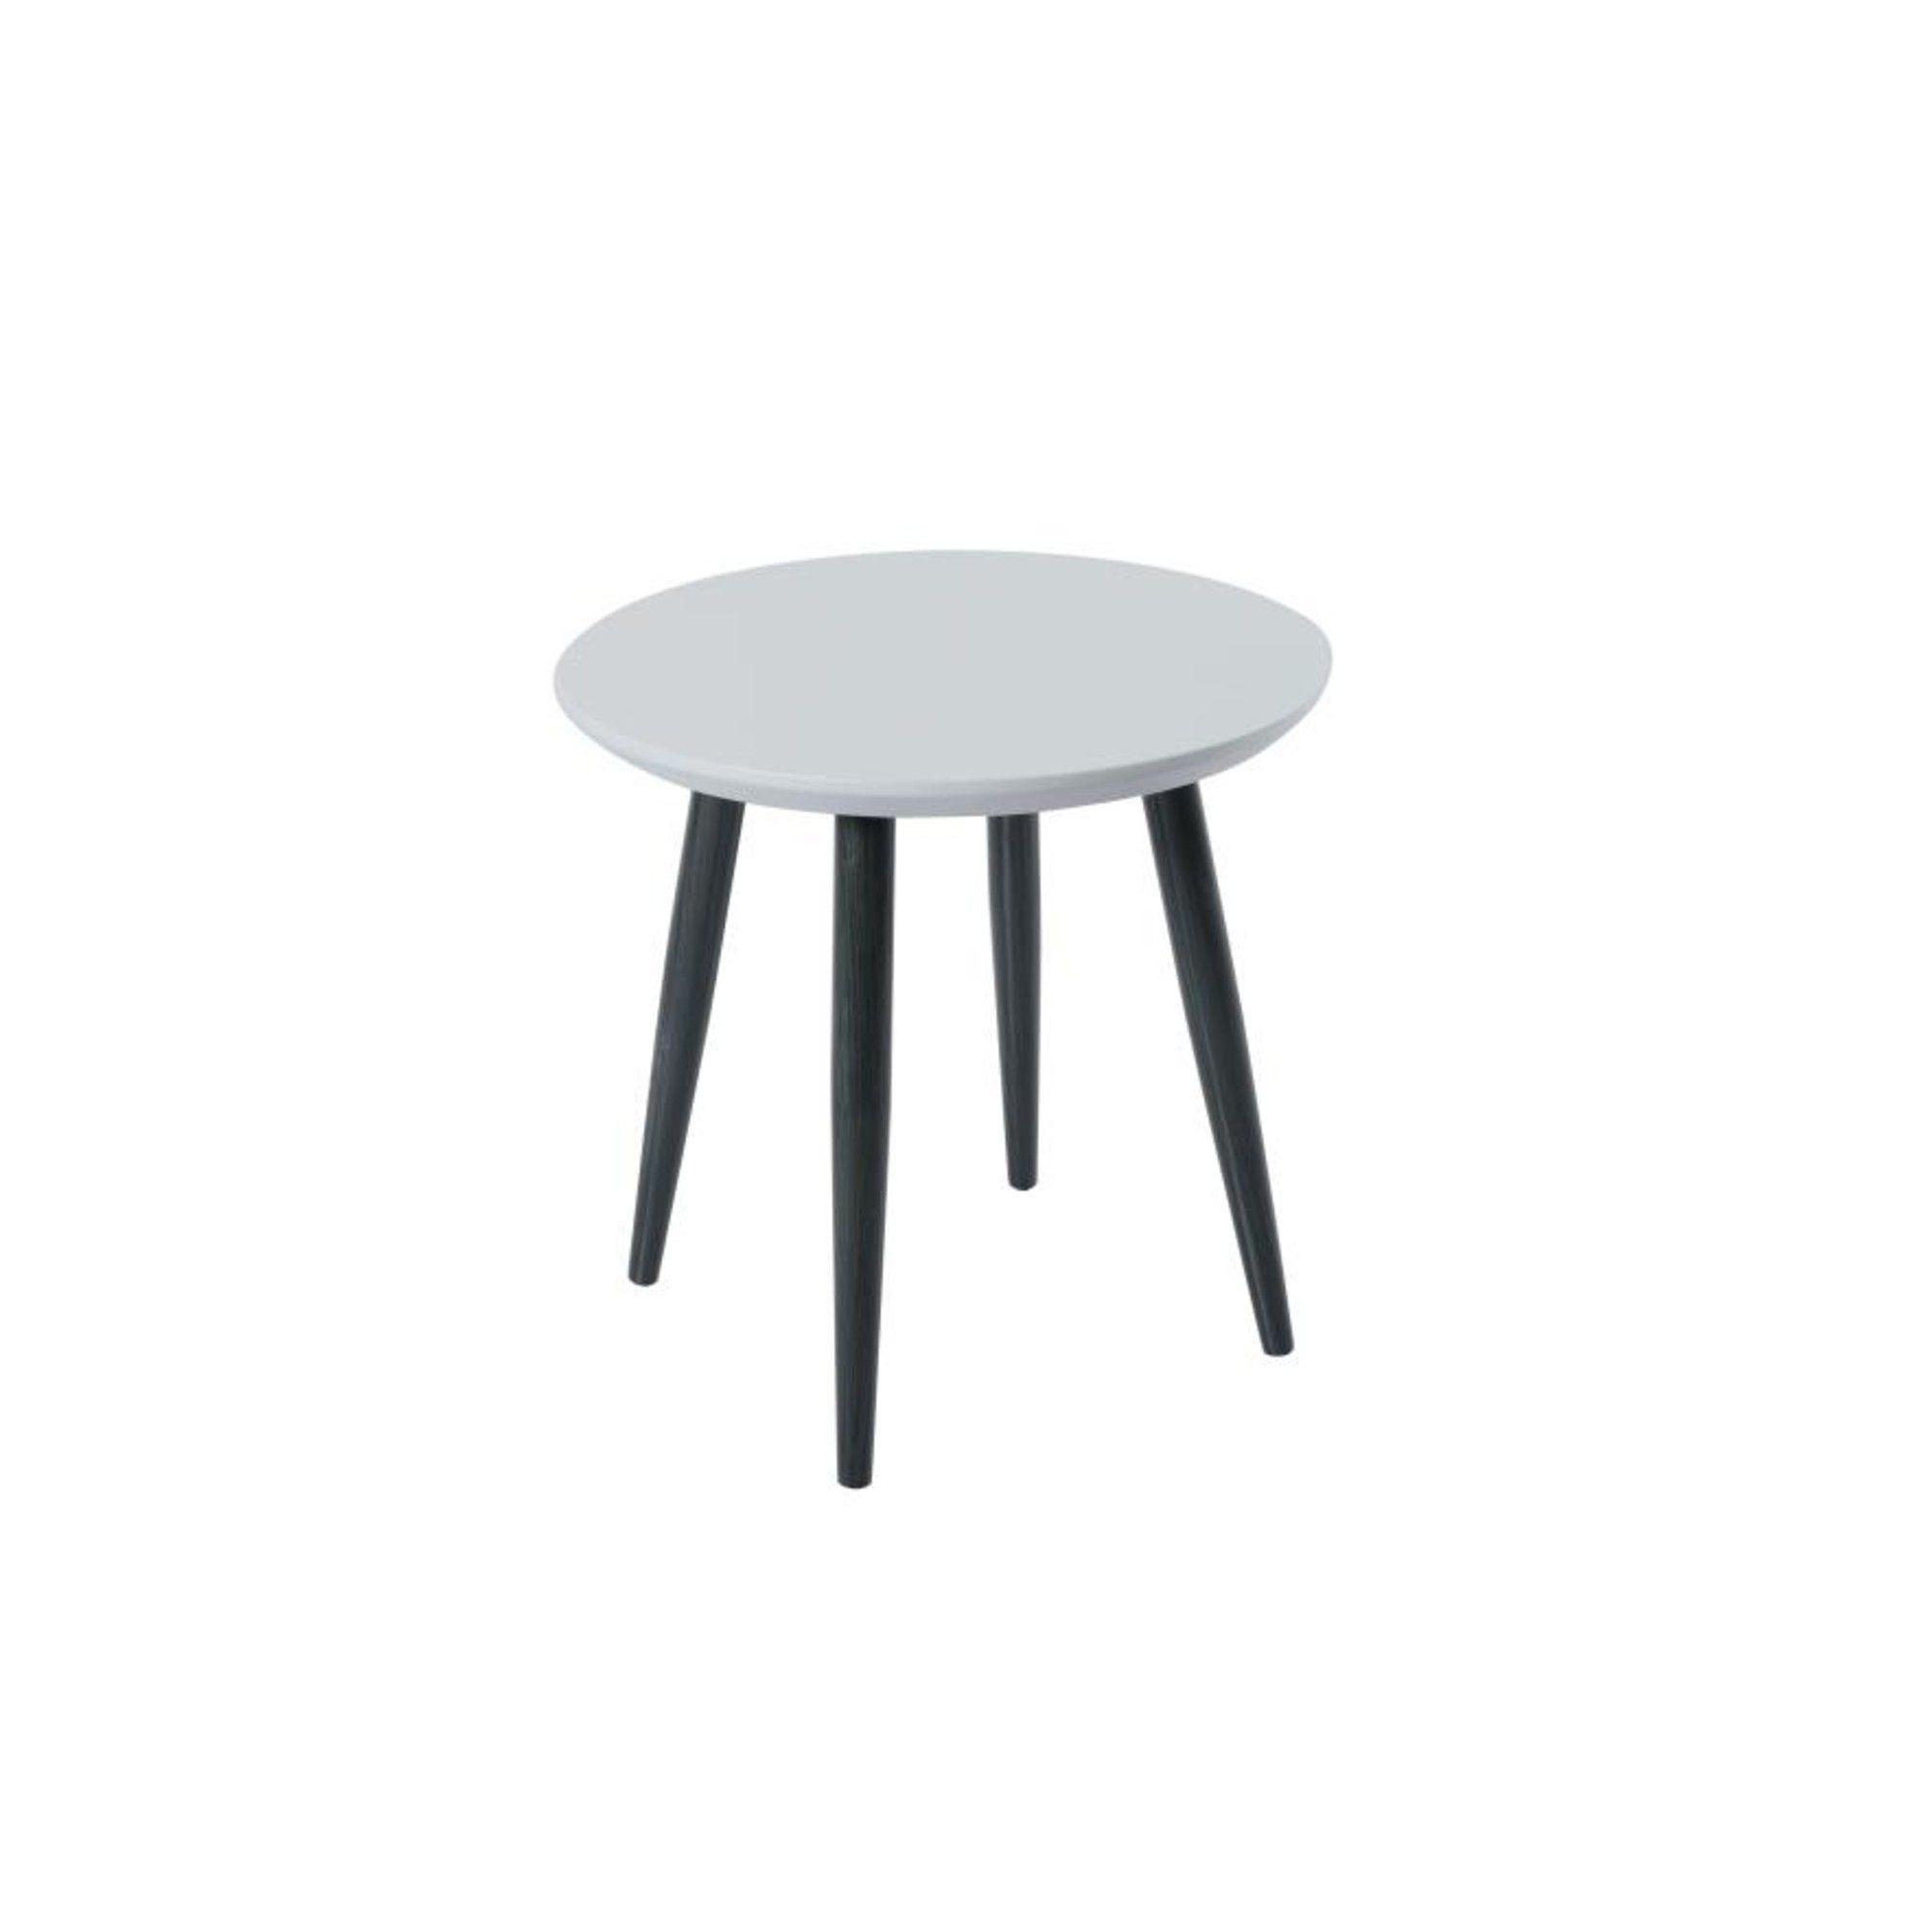 Orbit Circular End Table with a Light Grey Matt Finish